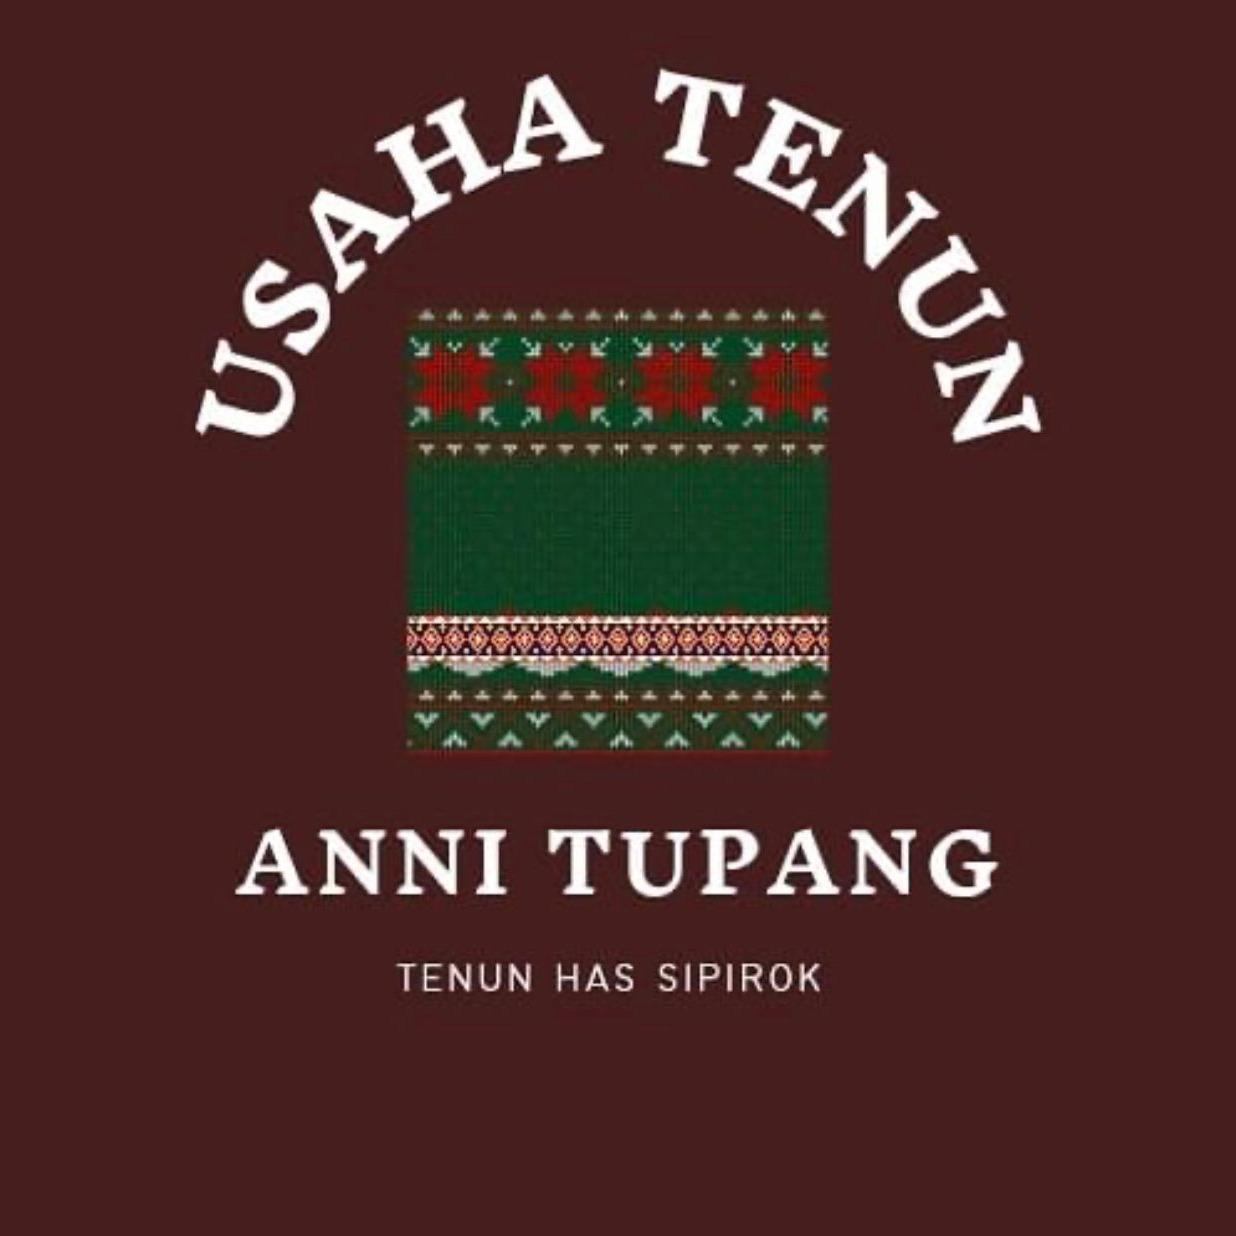 @TenunAnnieTupang Profile Image   Linktree